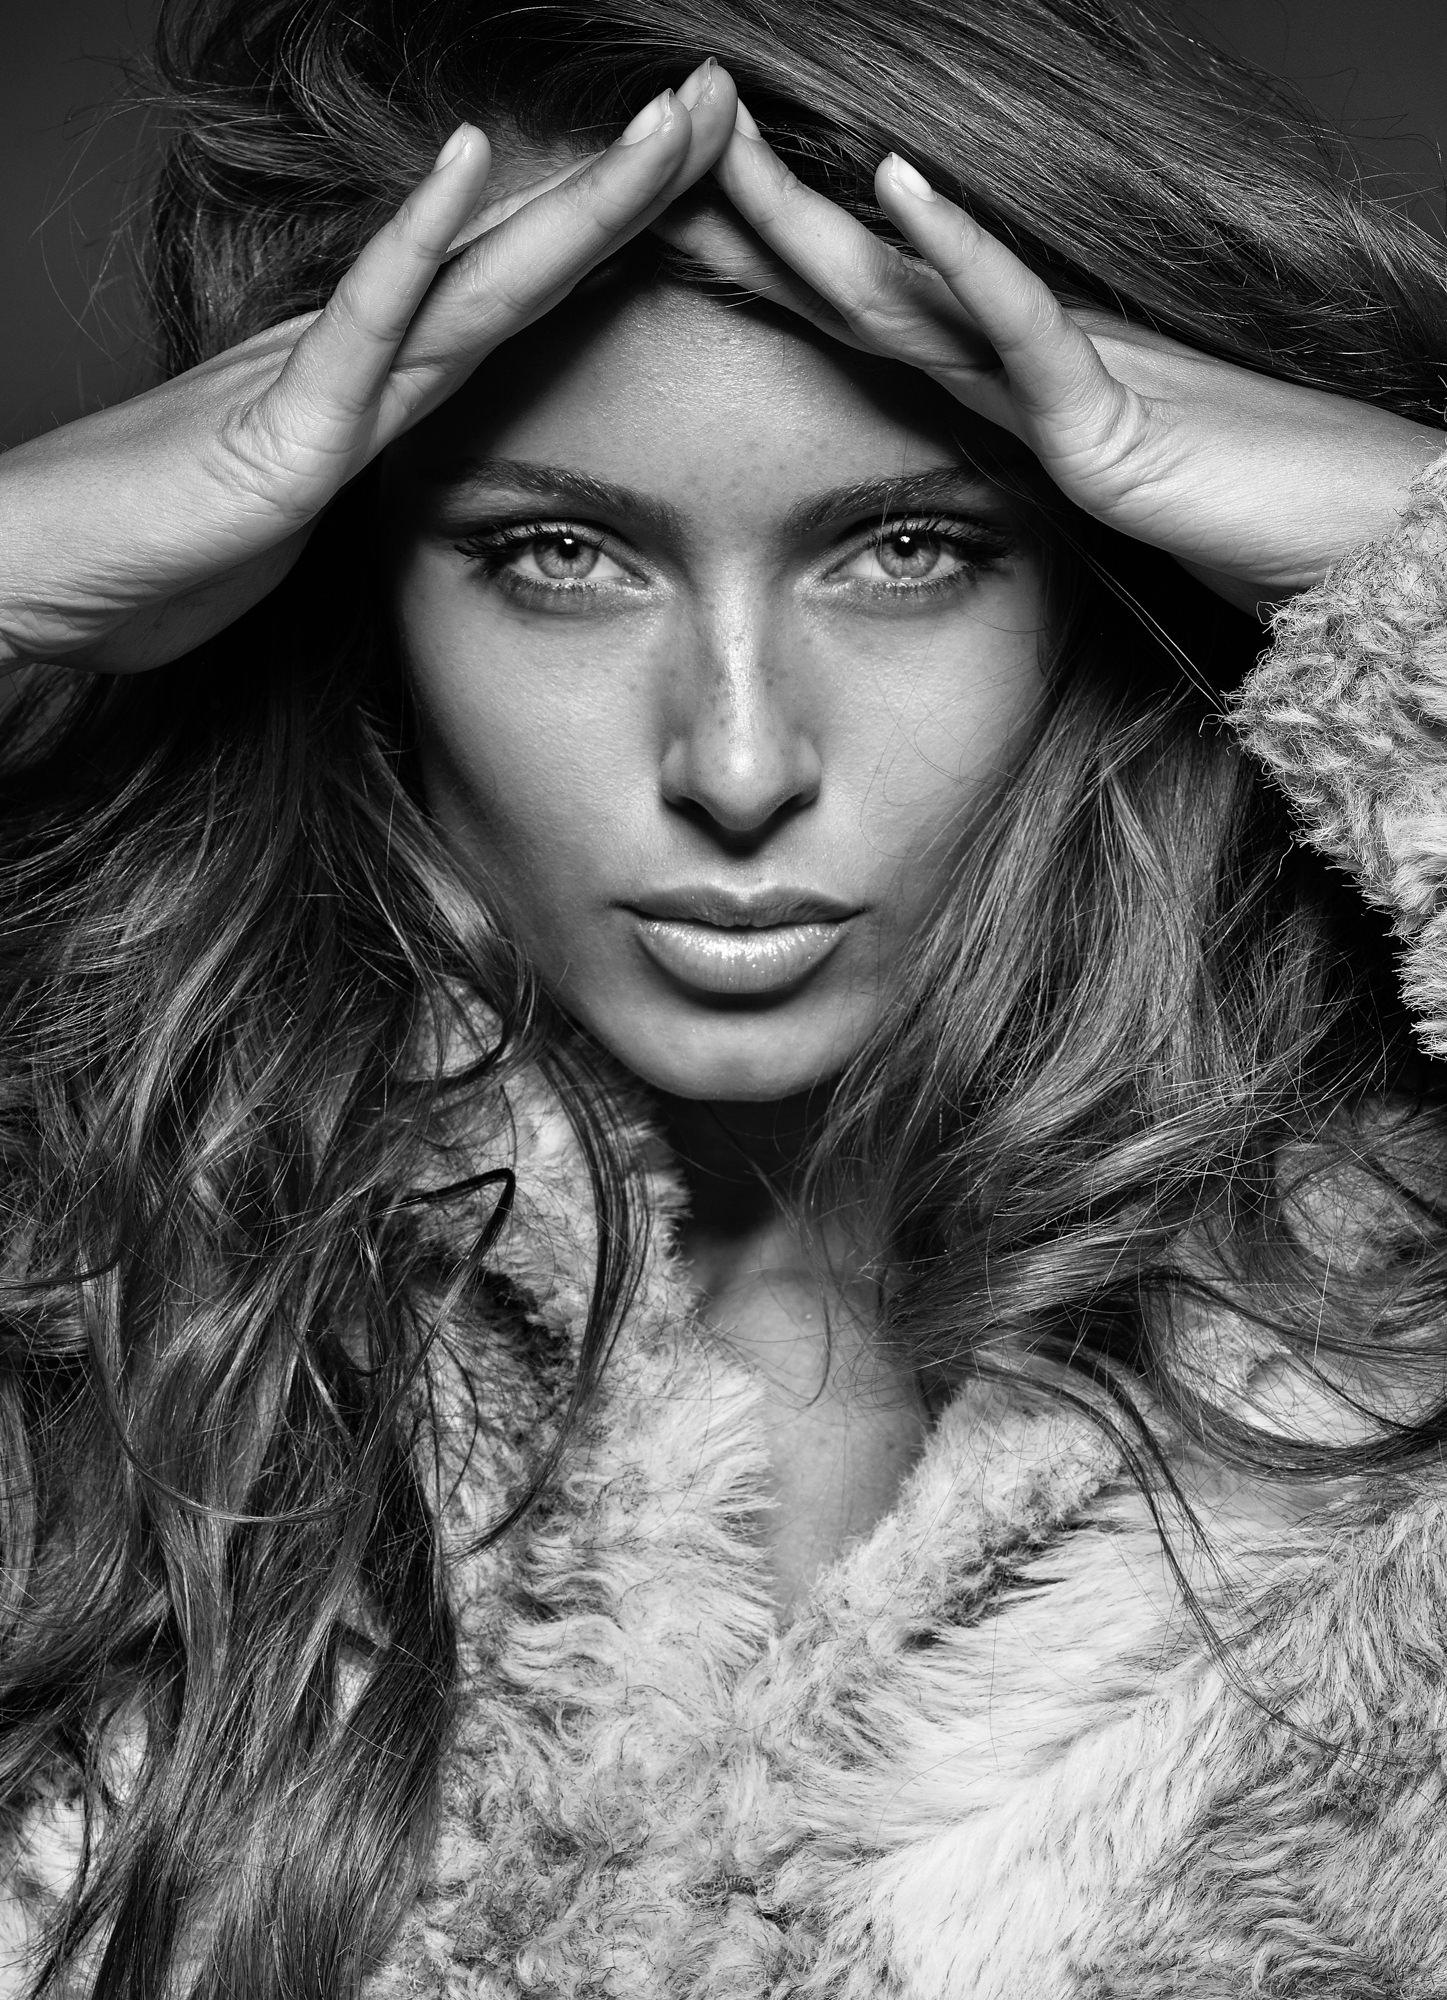 Tatyana Beauty Shots_Sh1_17469-EditA-Edit.jpg